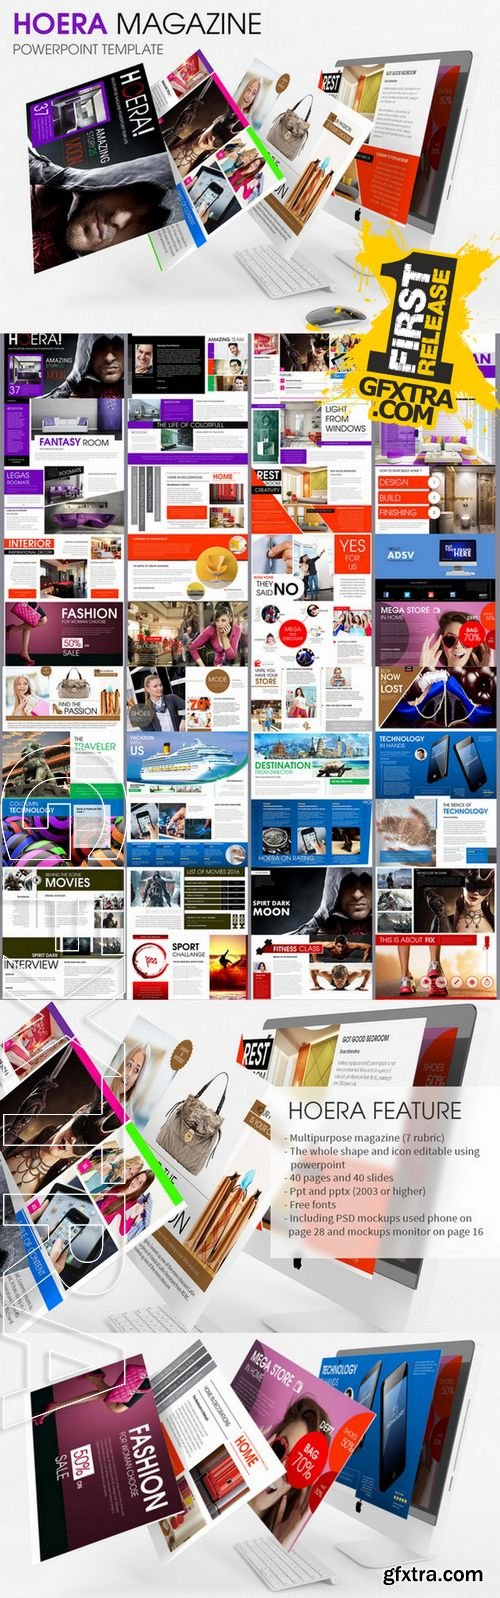 HOERA Magazine - Powerpoint Template - CM 174276